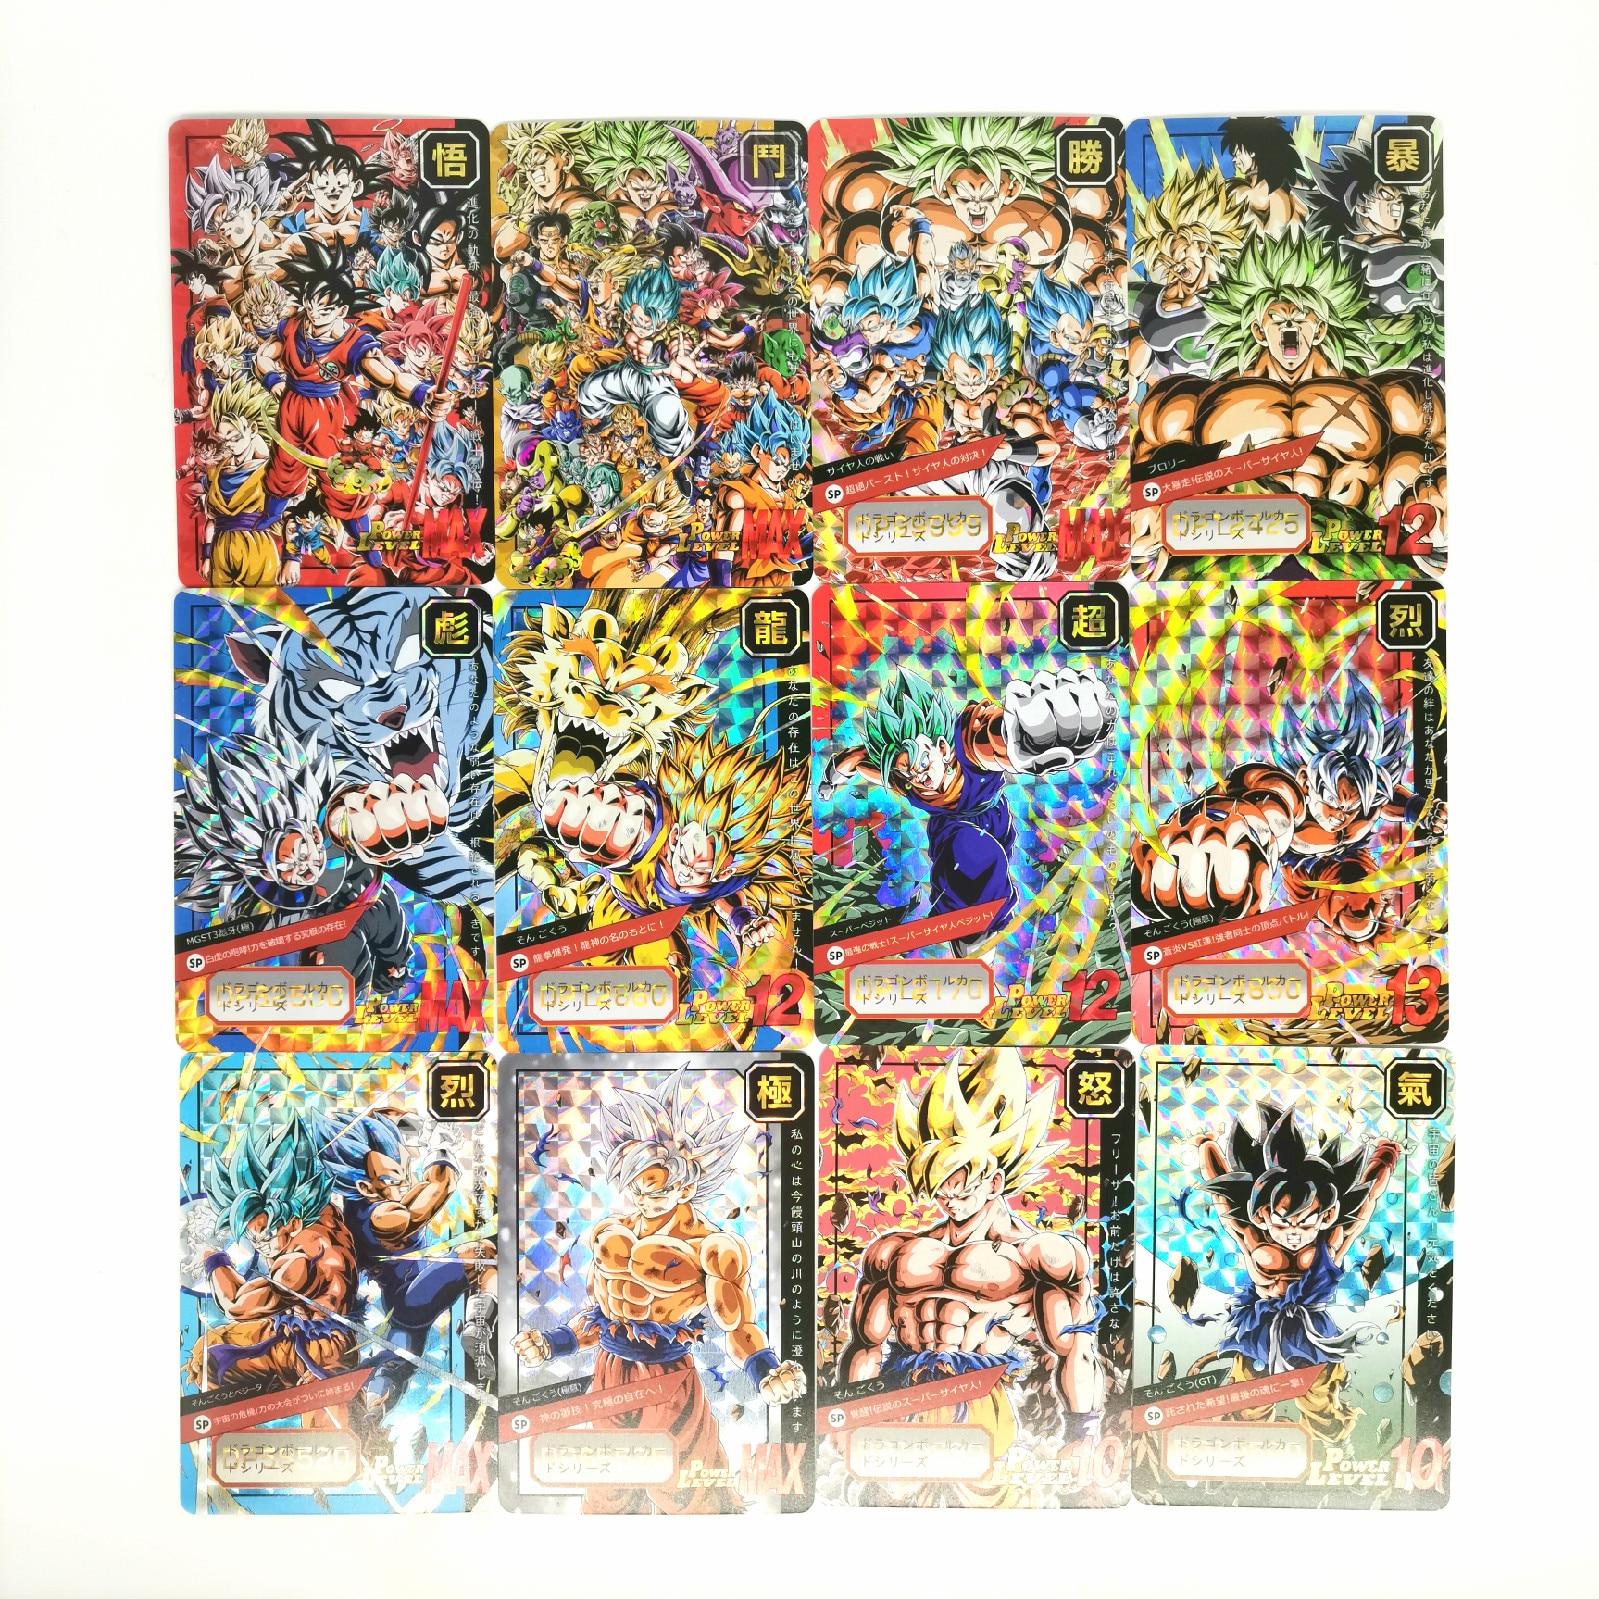 New 29pcs/set Super Dragon Ball Z Heroes Battle Card Ultra Instinct Goku Vegeta Game Collection Cards